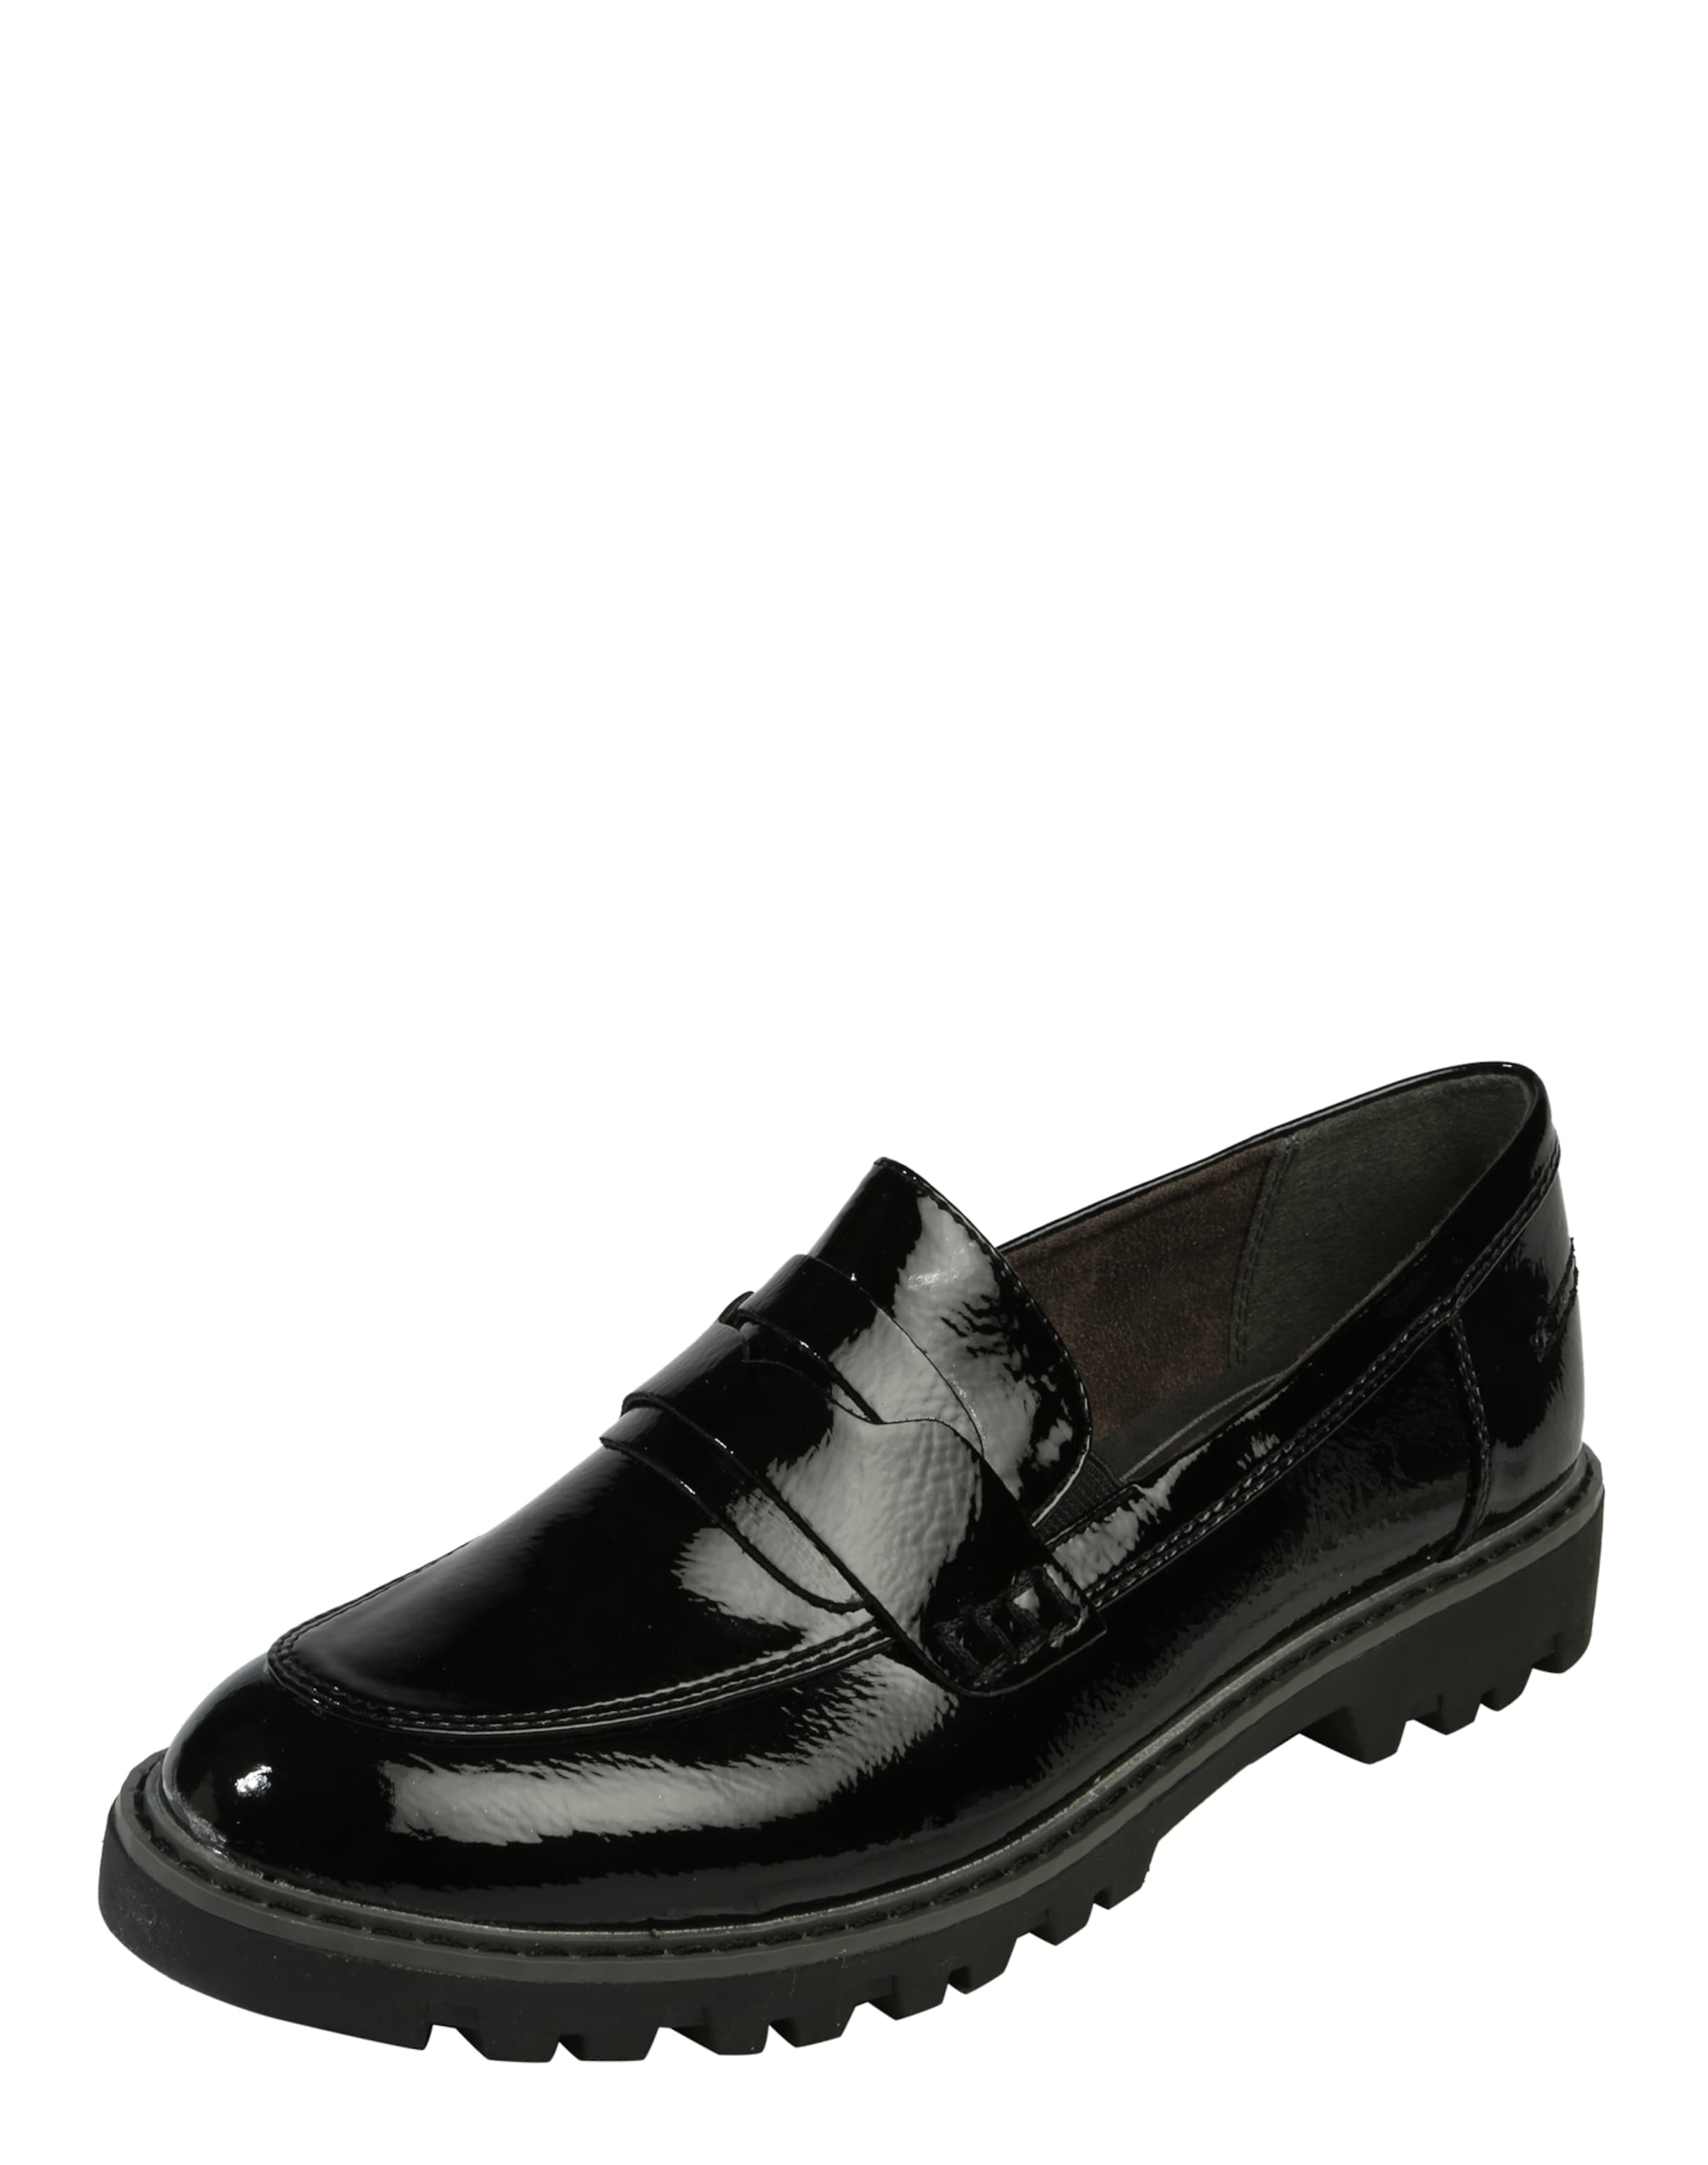 TAMARIS Loafer in Lack-Optik Verschleißfeste billige Schuhe